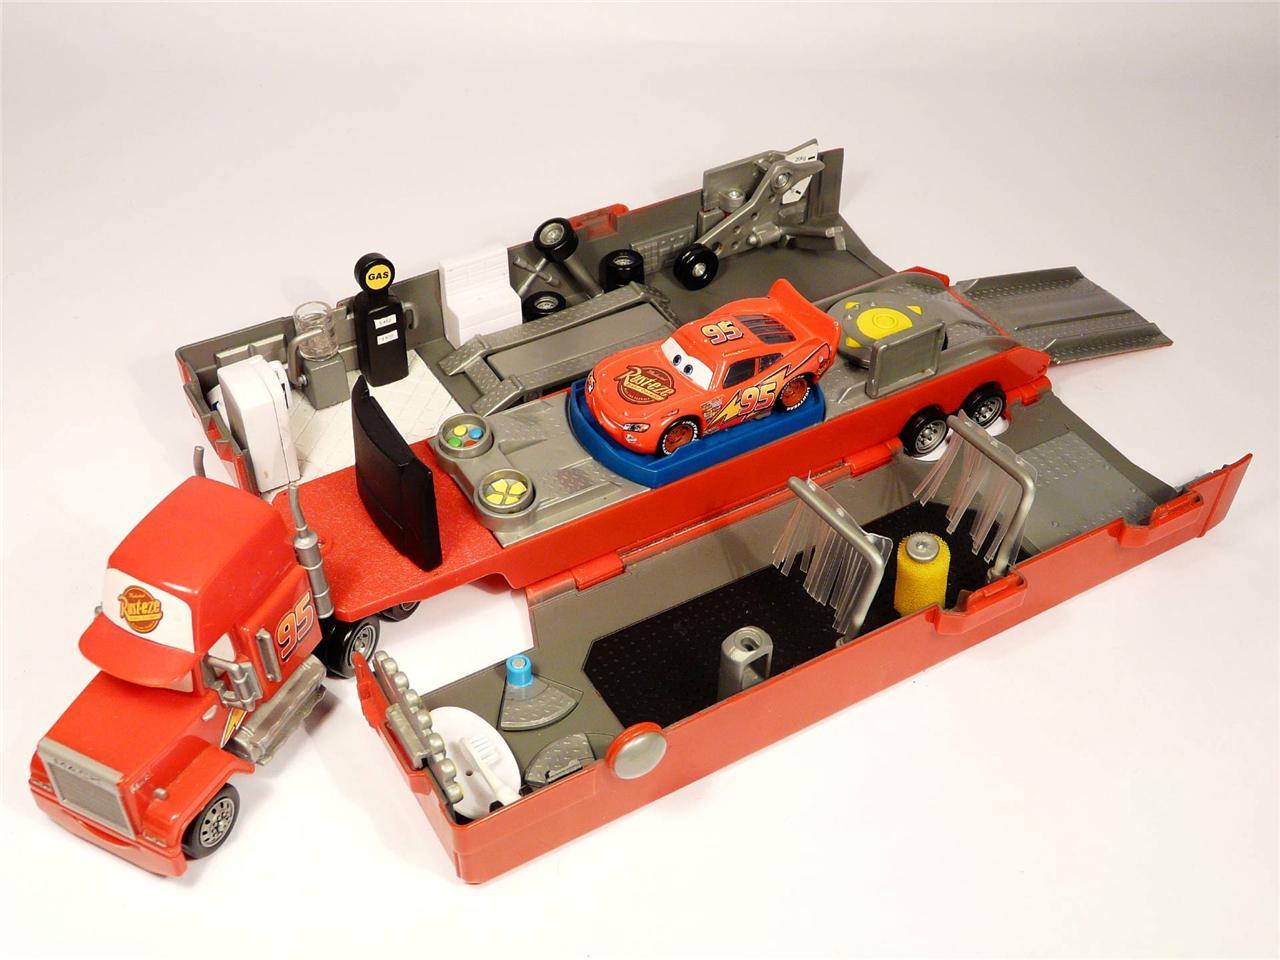 Lightning Mcqueen Mack Truck Hauler : Disney pixar cars mack truck playset hauler lorry diecast